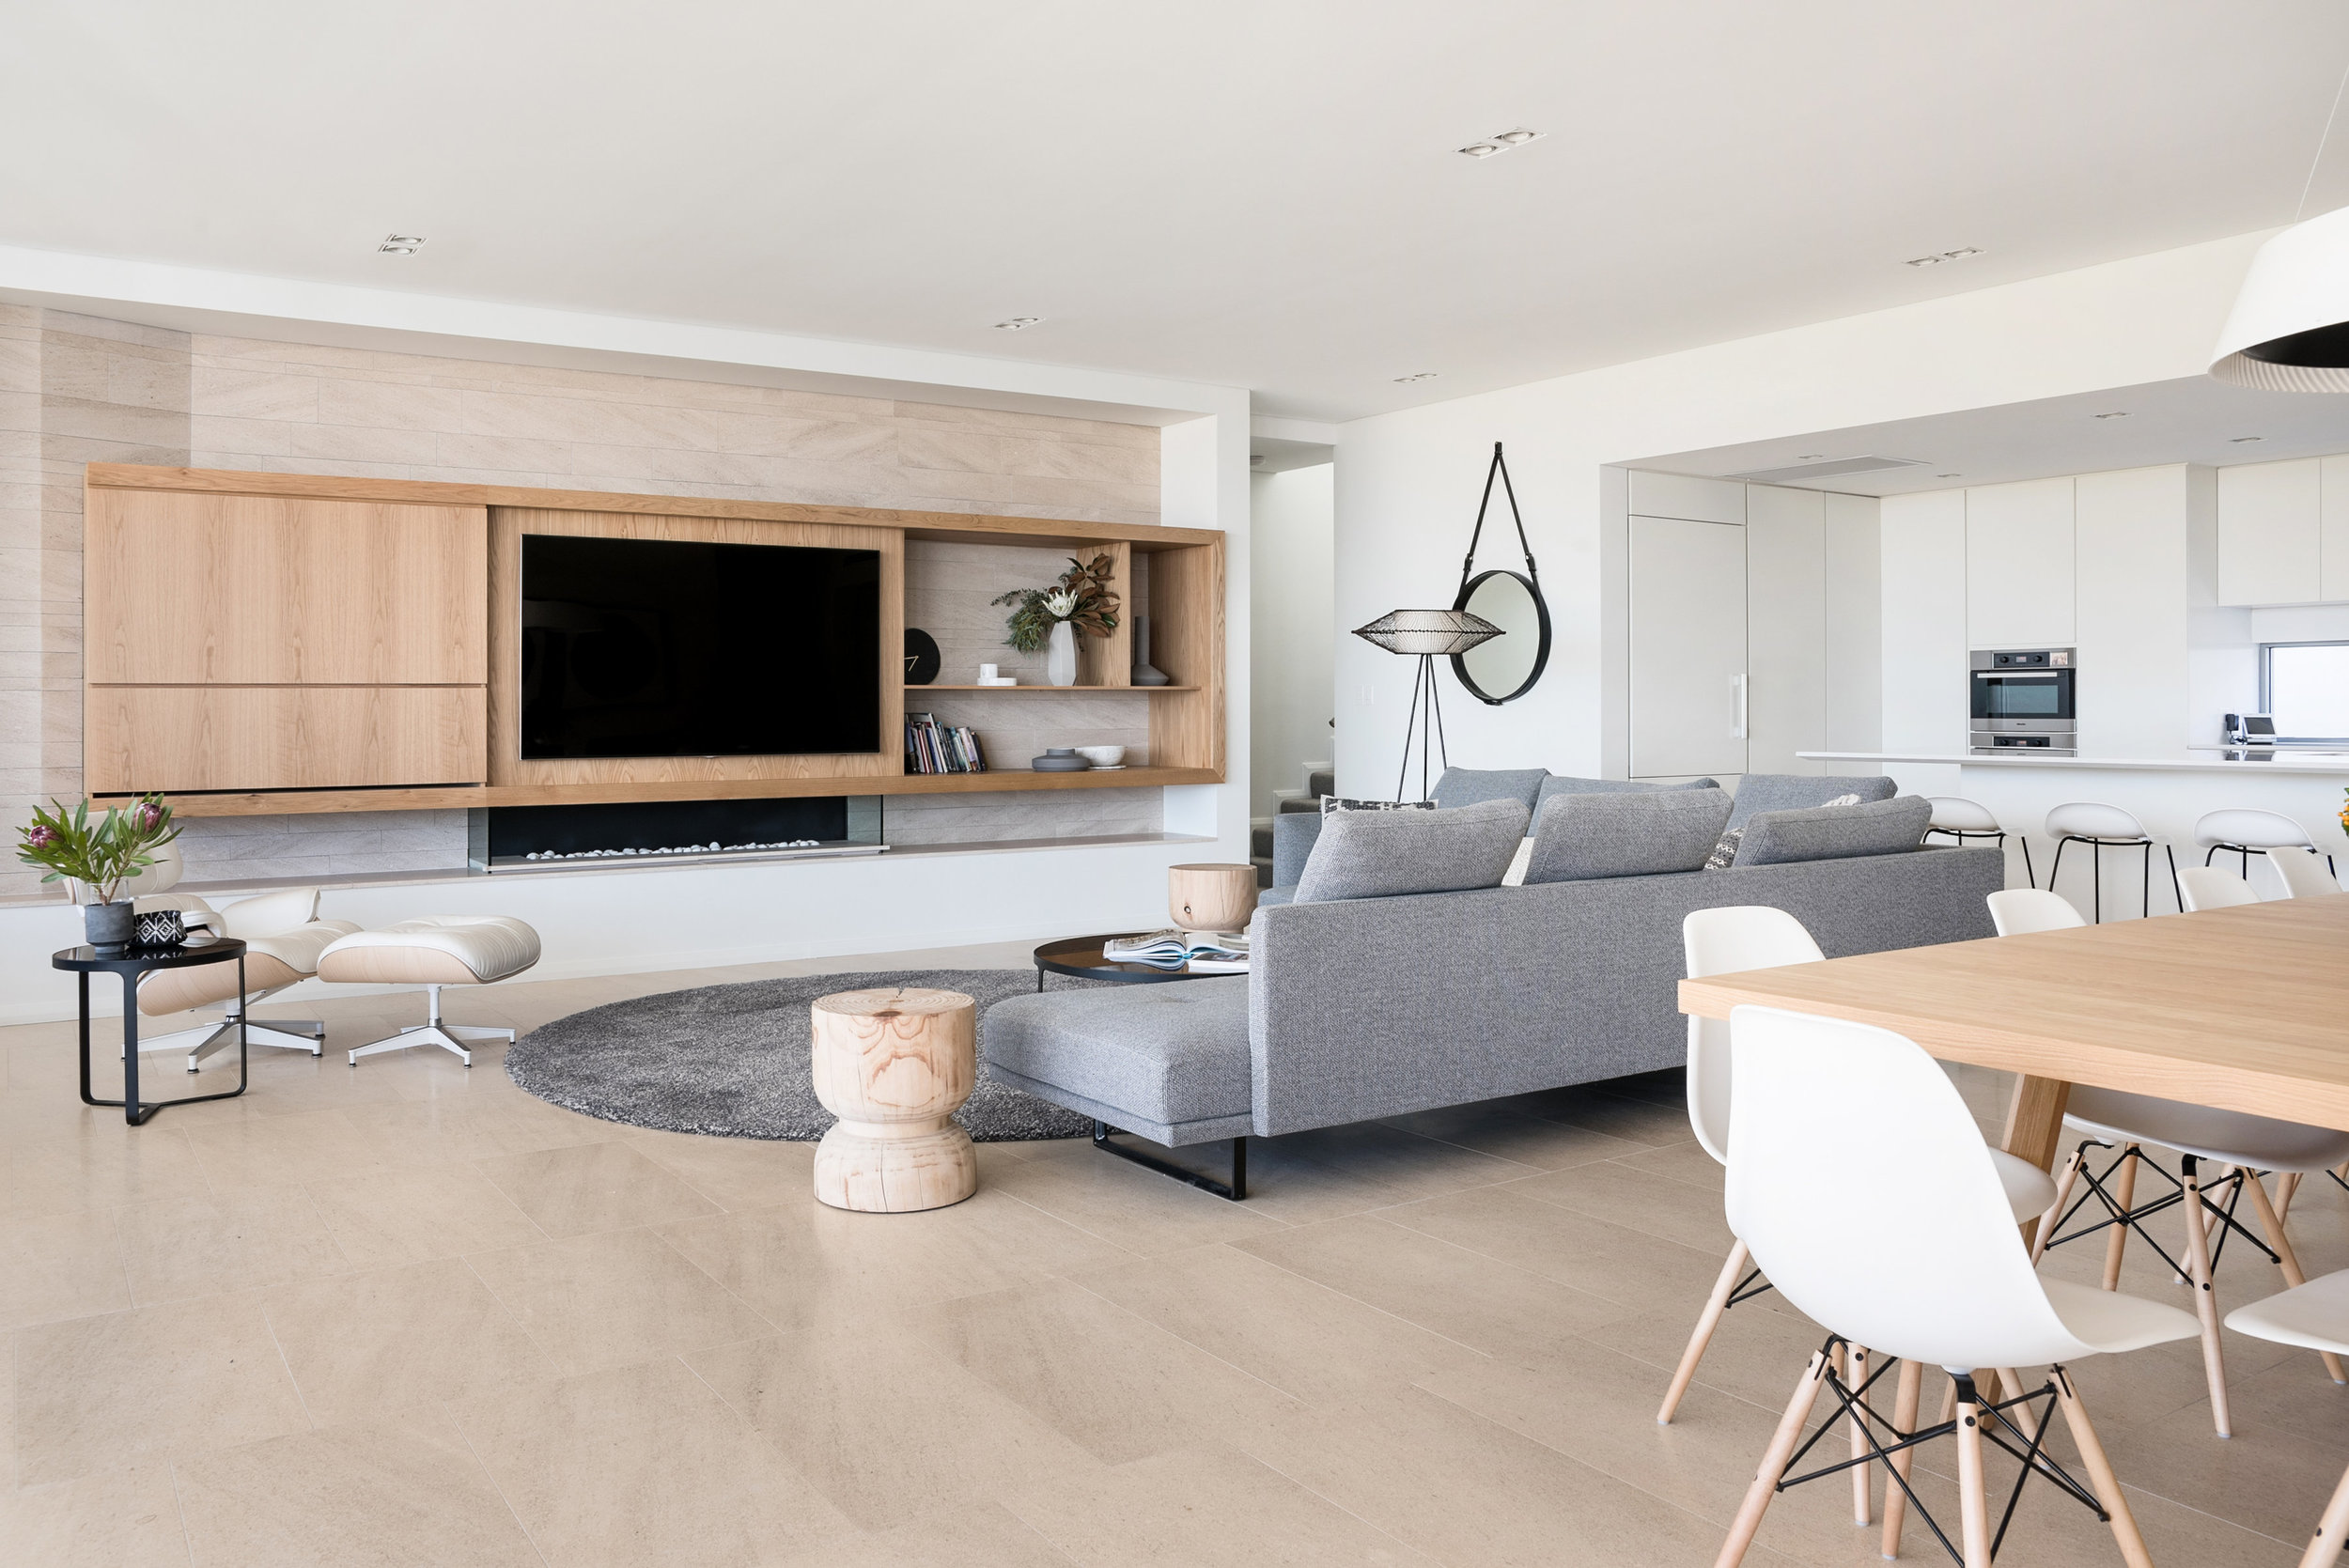 Turner_Interior_Design_North_Beach_home2 copy.jpg